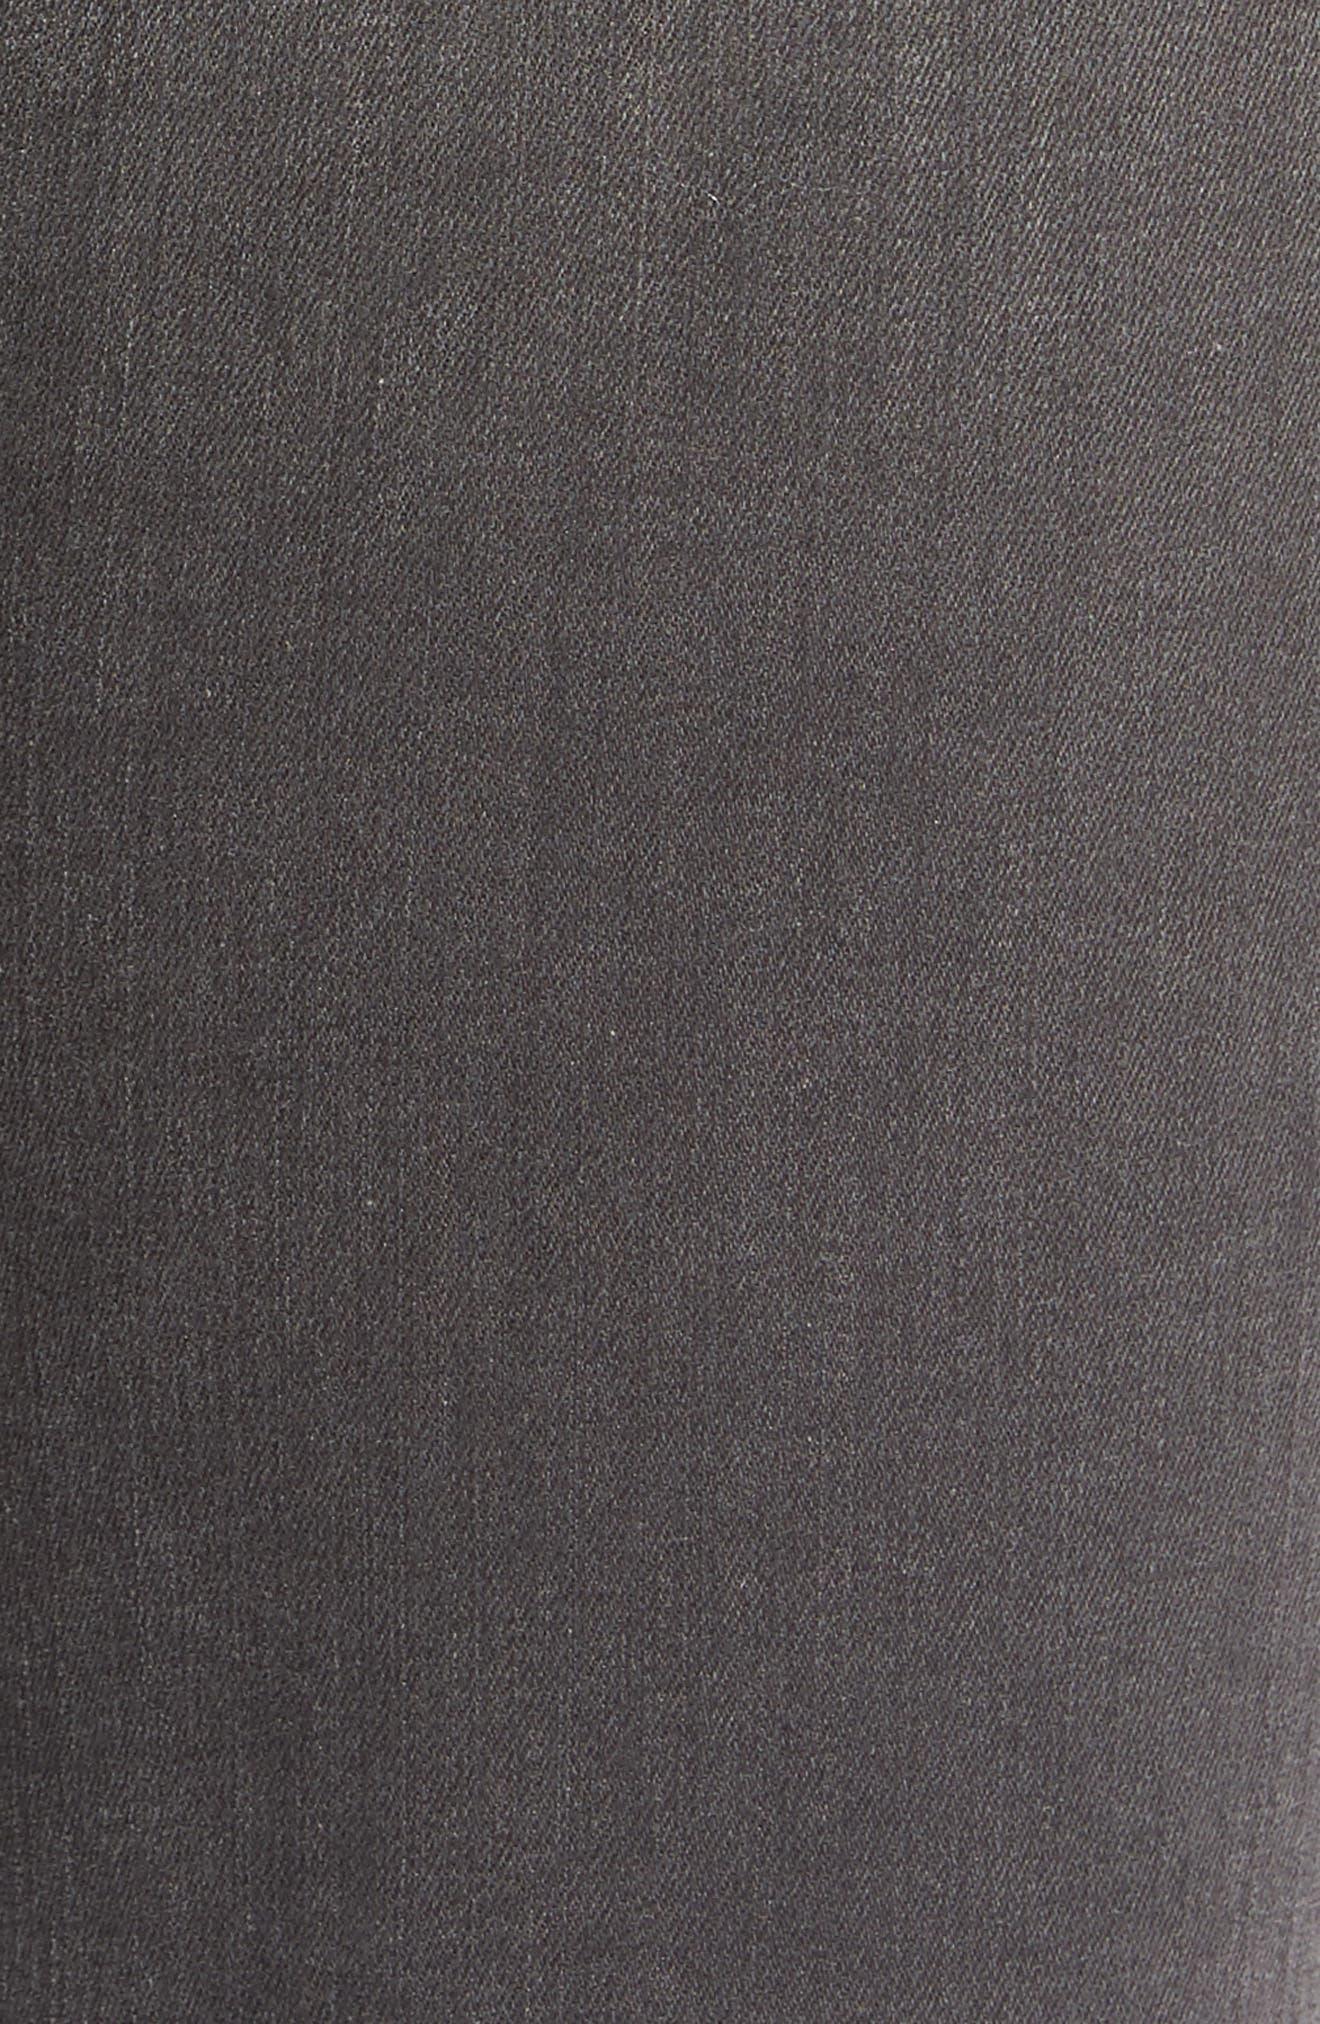 Maria High Waist Skinny Jeans,                             Alternate thumbnail 4, color,                             Nightbird